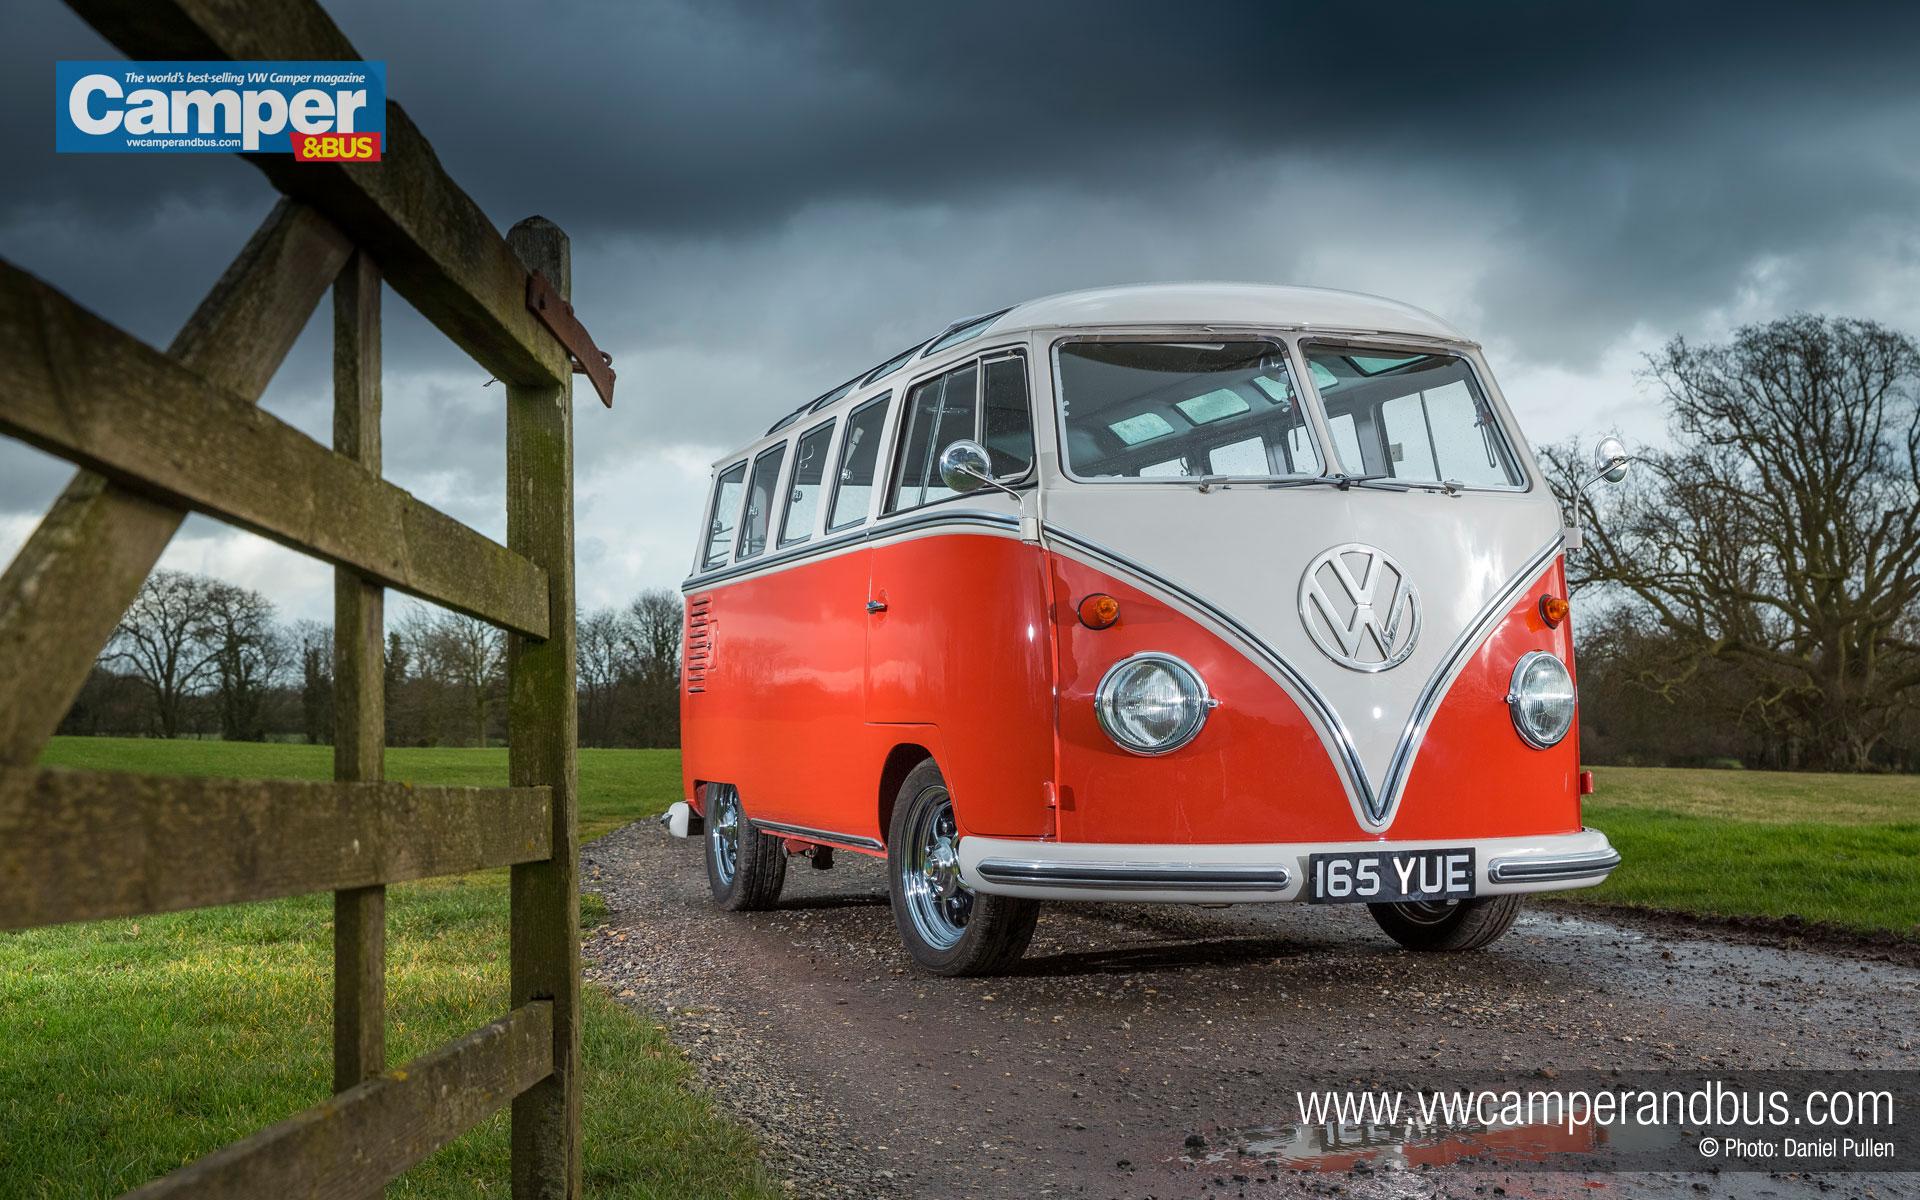 Vw Bus 2015 >> 23-window Deluxe Microbus desktop wallpaper - VW Camper and Bus